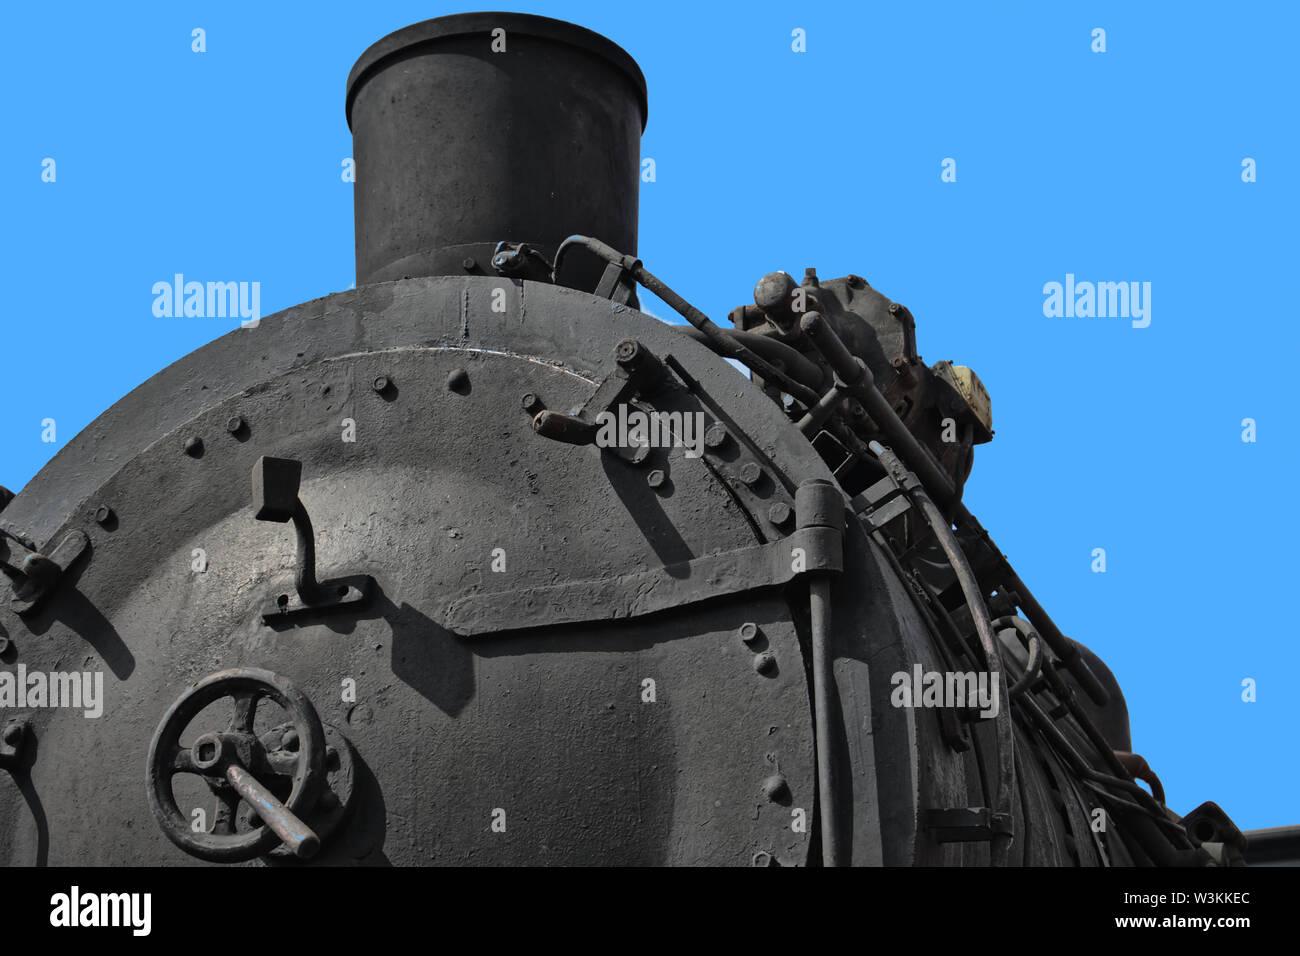 Close-up of a historic black steam locomotive Stock Photo